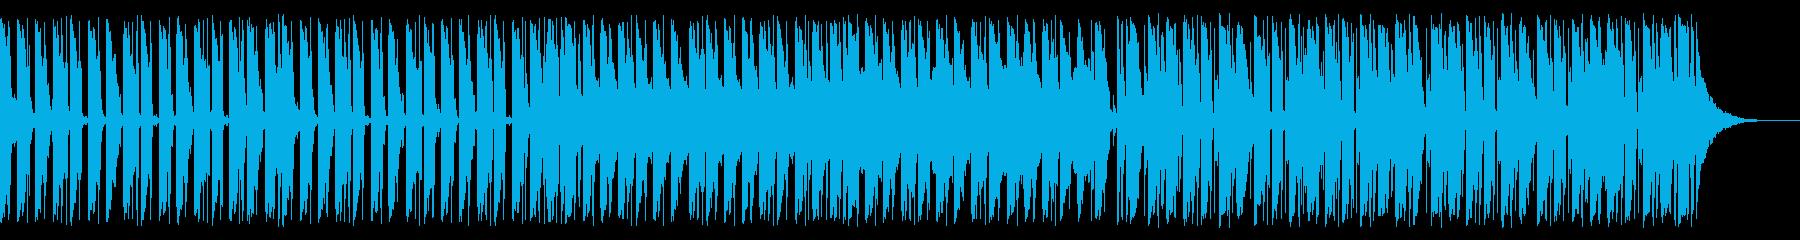 133 BPMの再生済みの波形